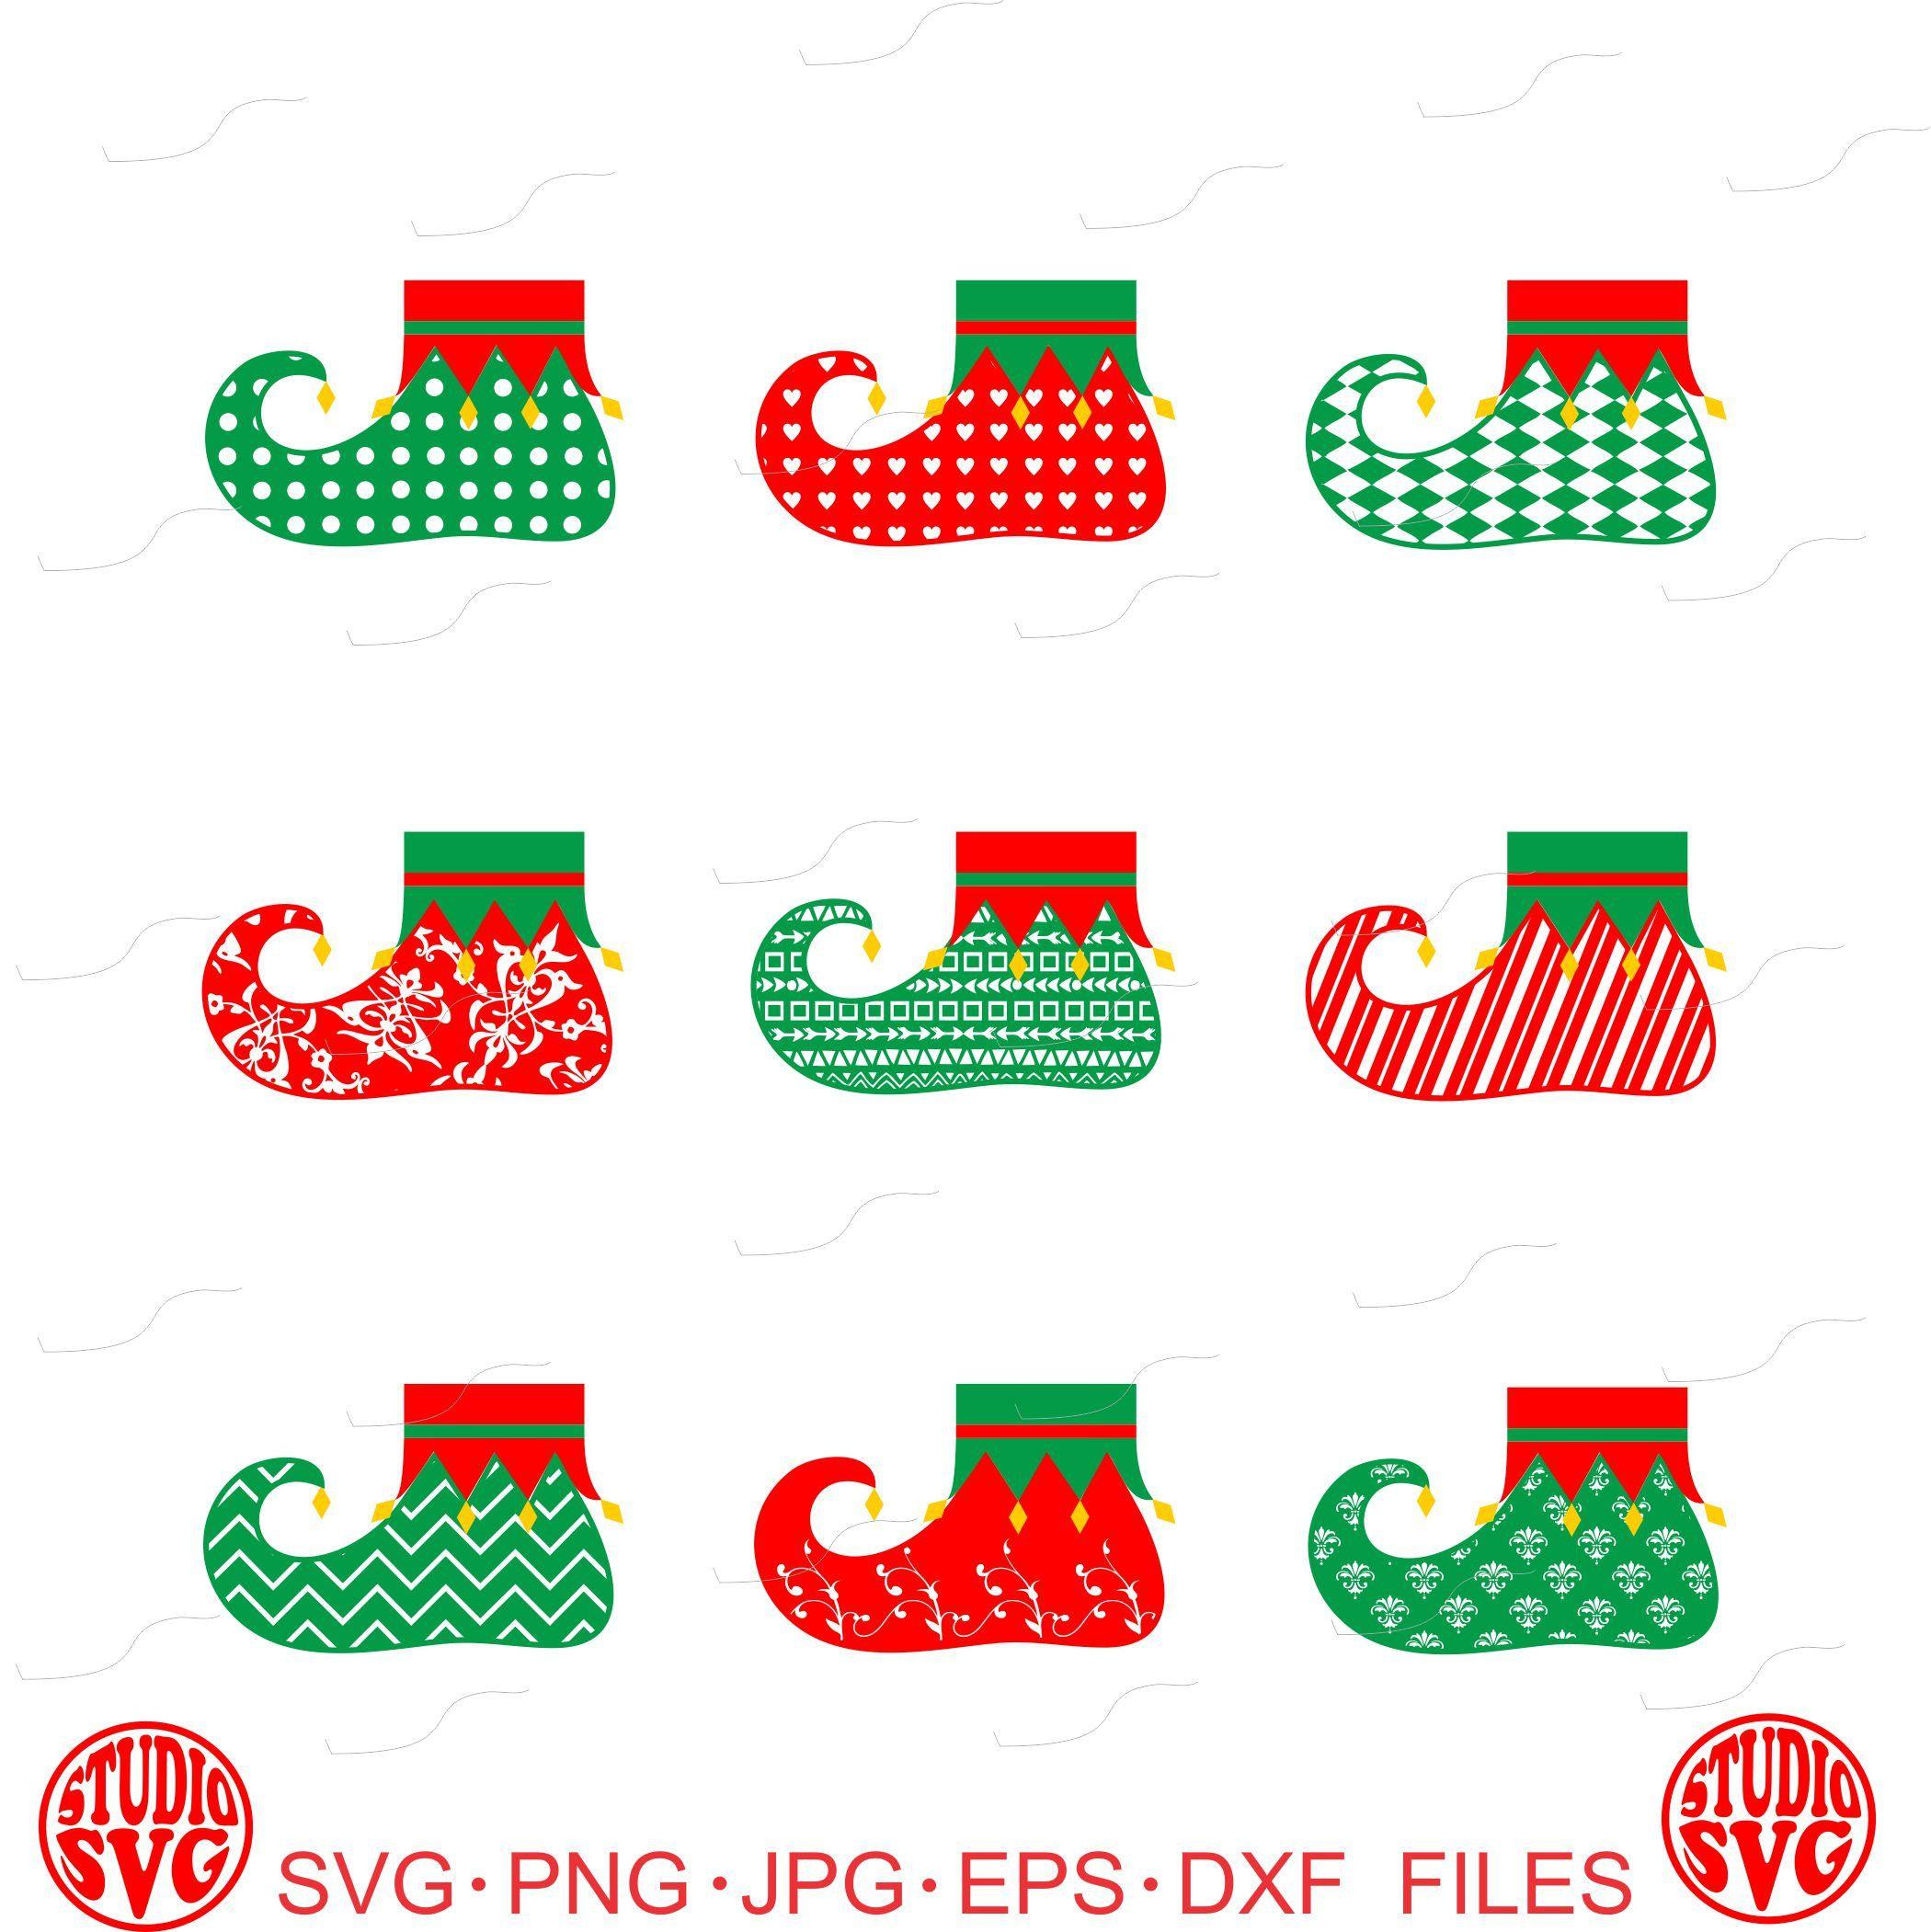 Elf boots elf shoes elf stockings vinyl decal digital cut file